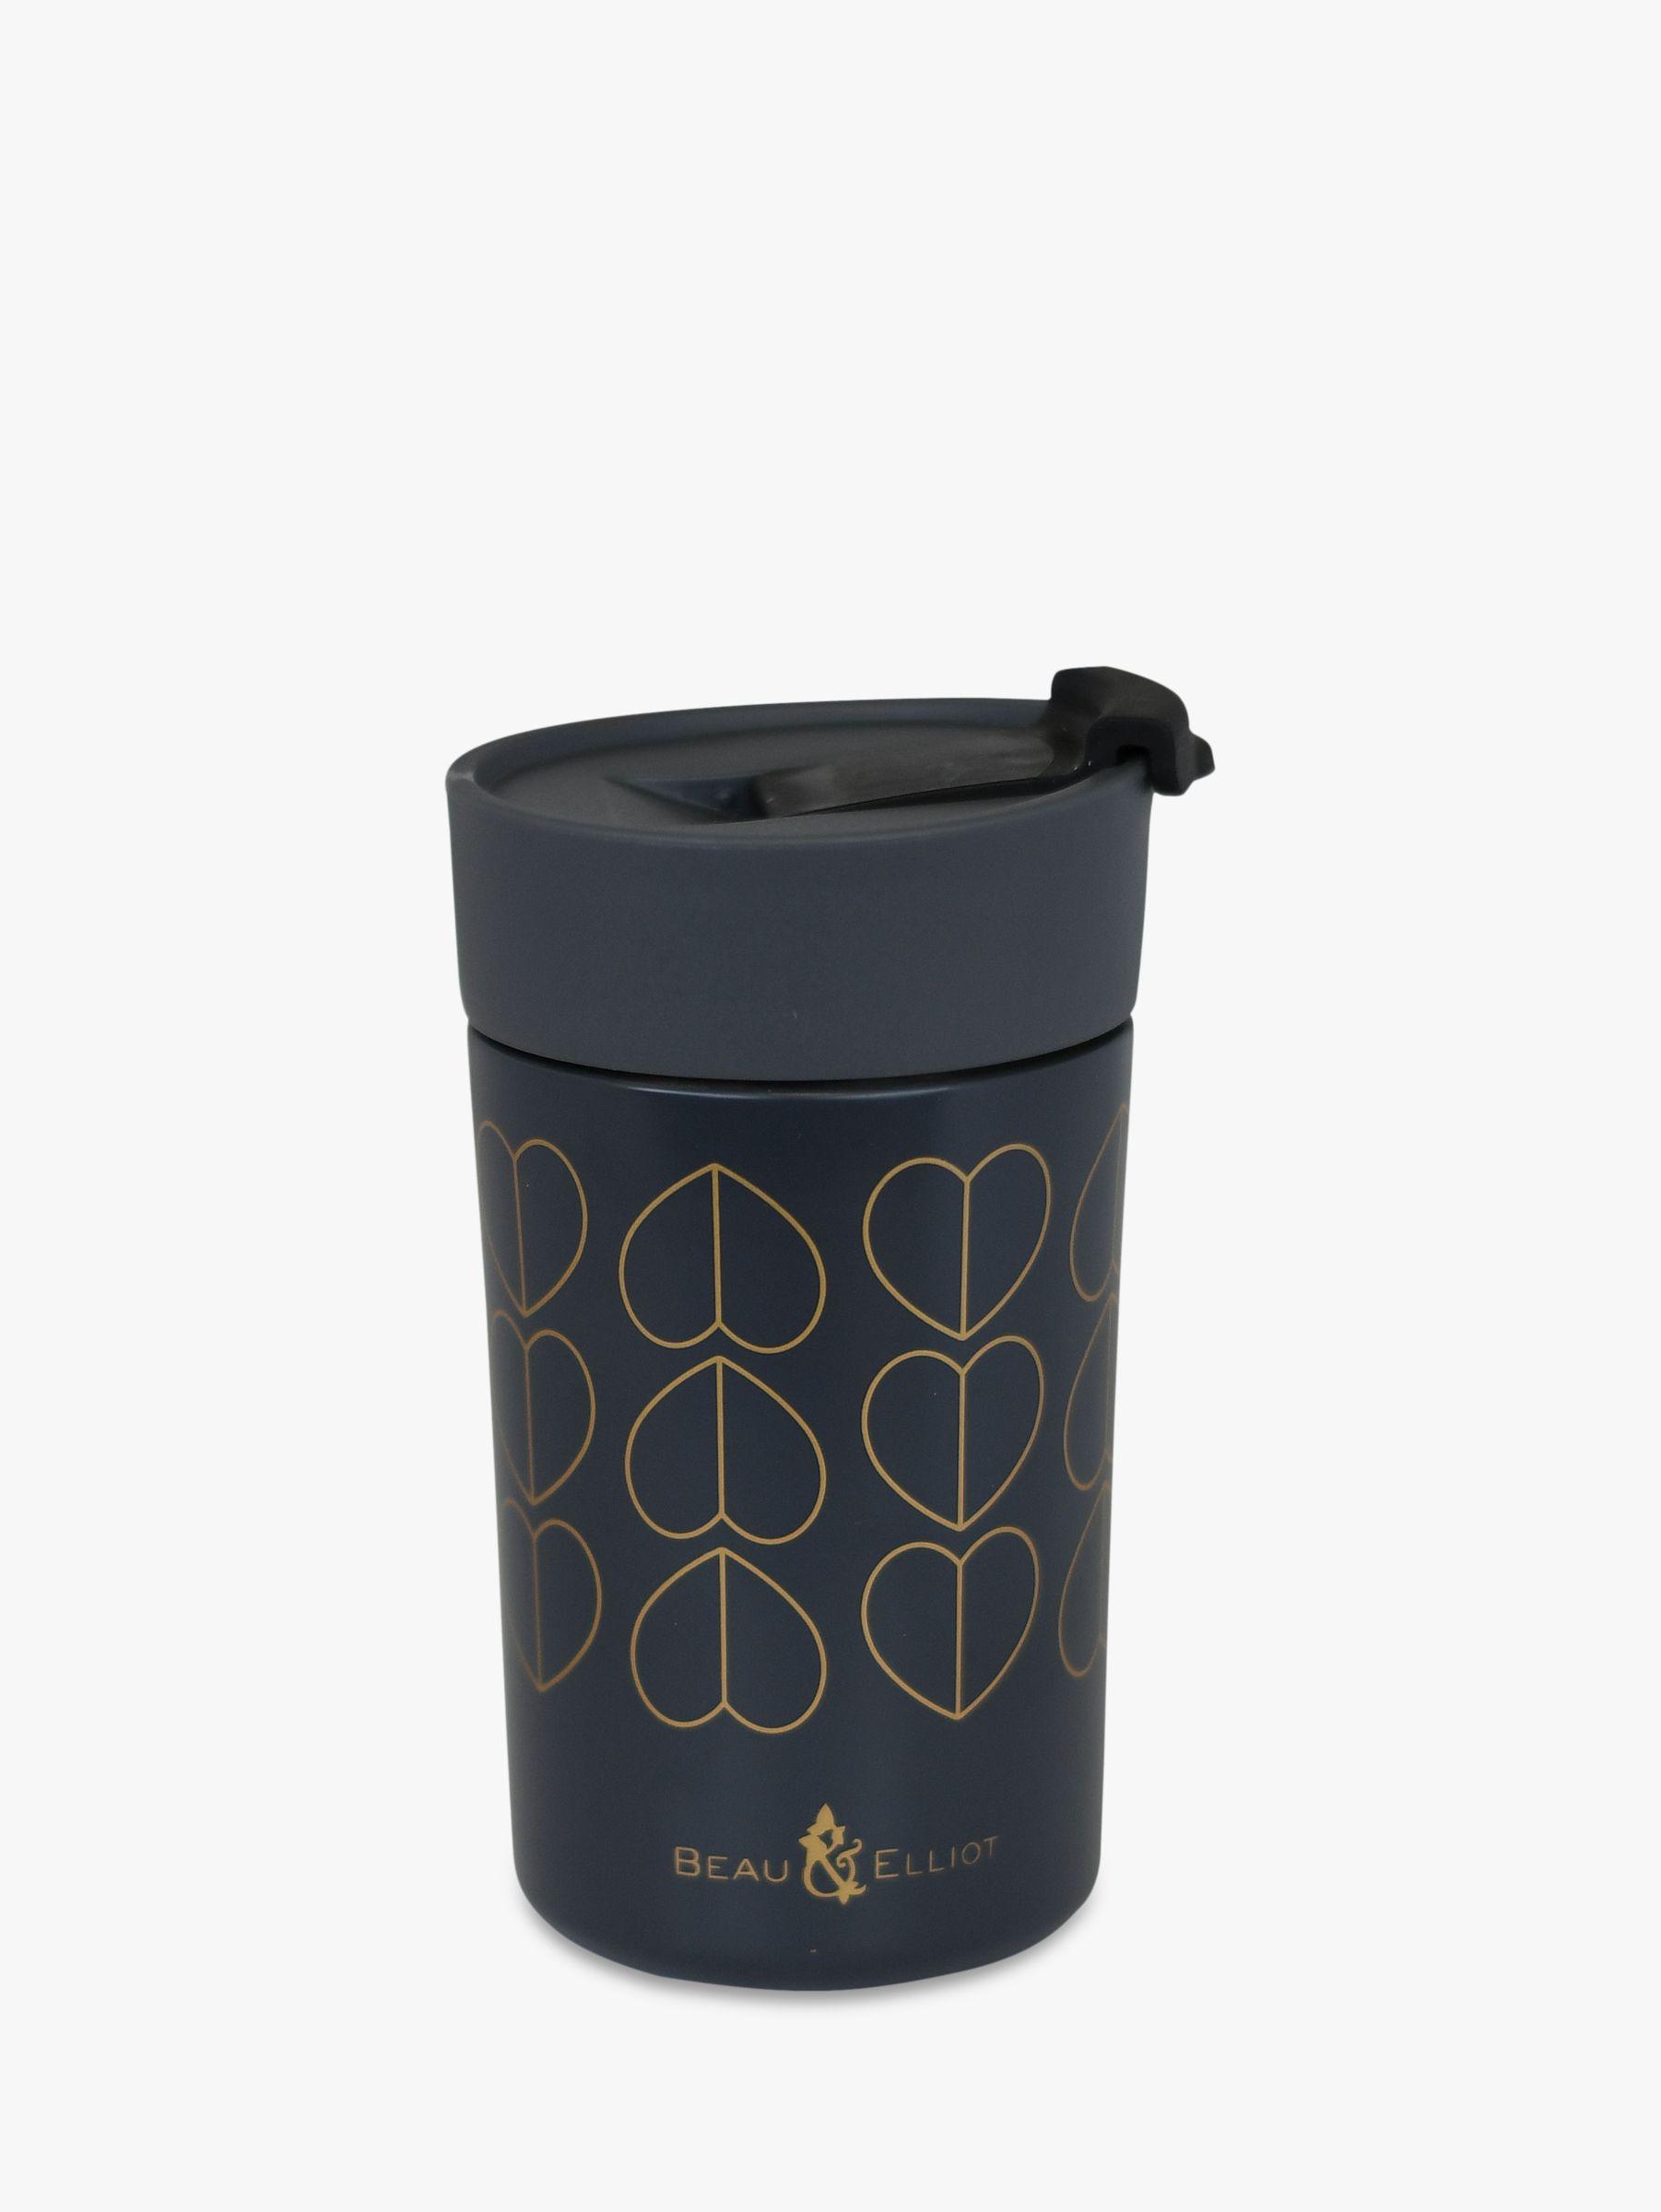 Beau Elliot Dove Insulated Travel Mug Black Gold 350ml At John Lewis Partners